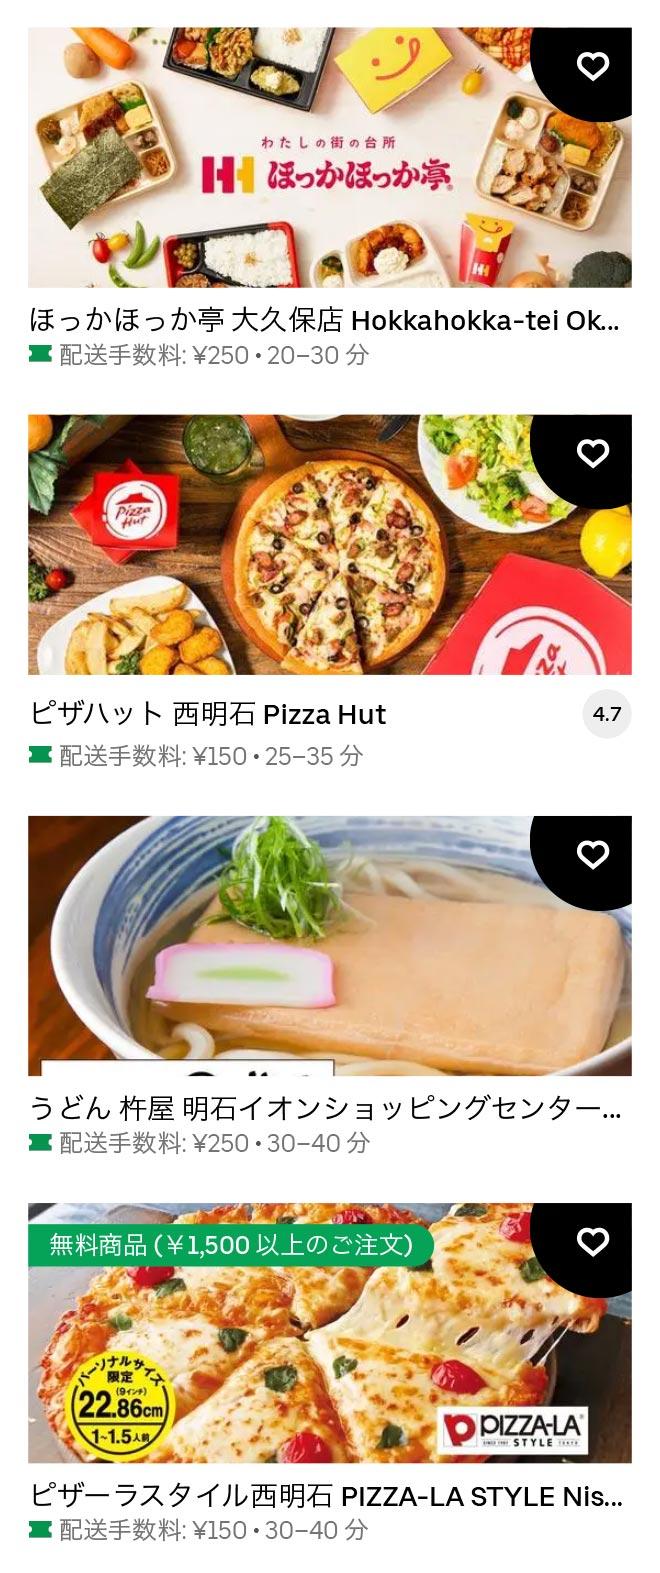 U nishi akashi 2103 09